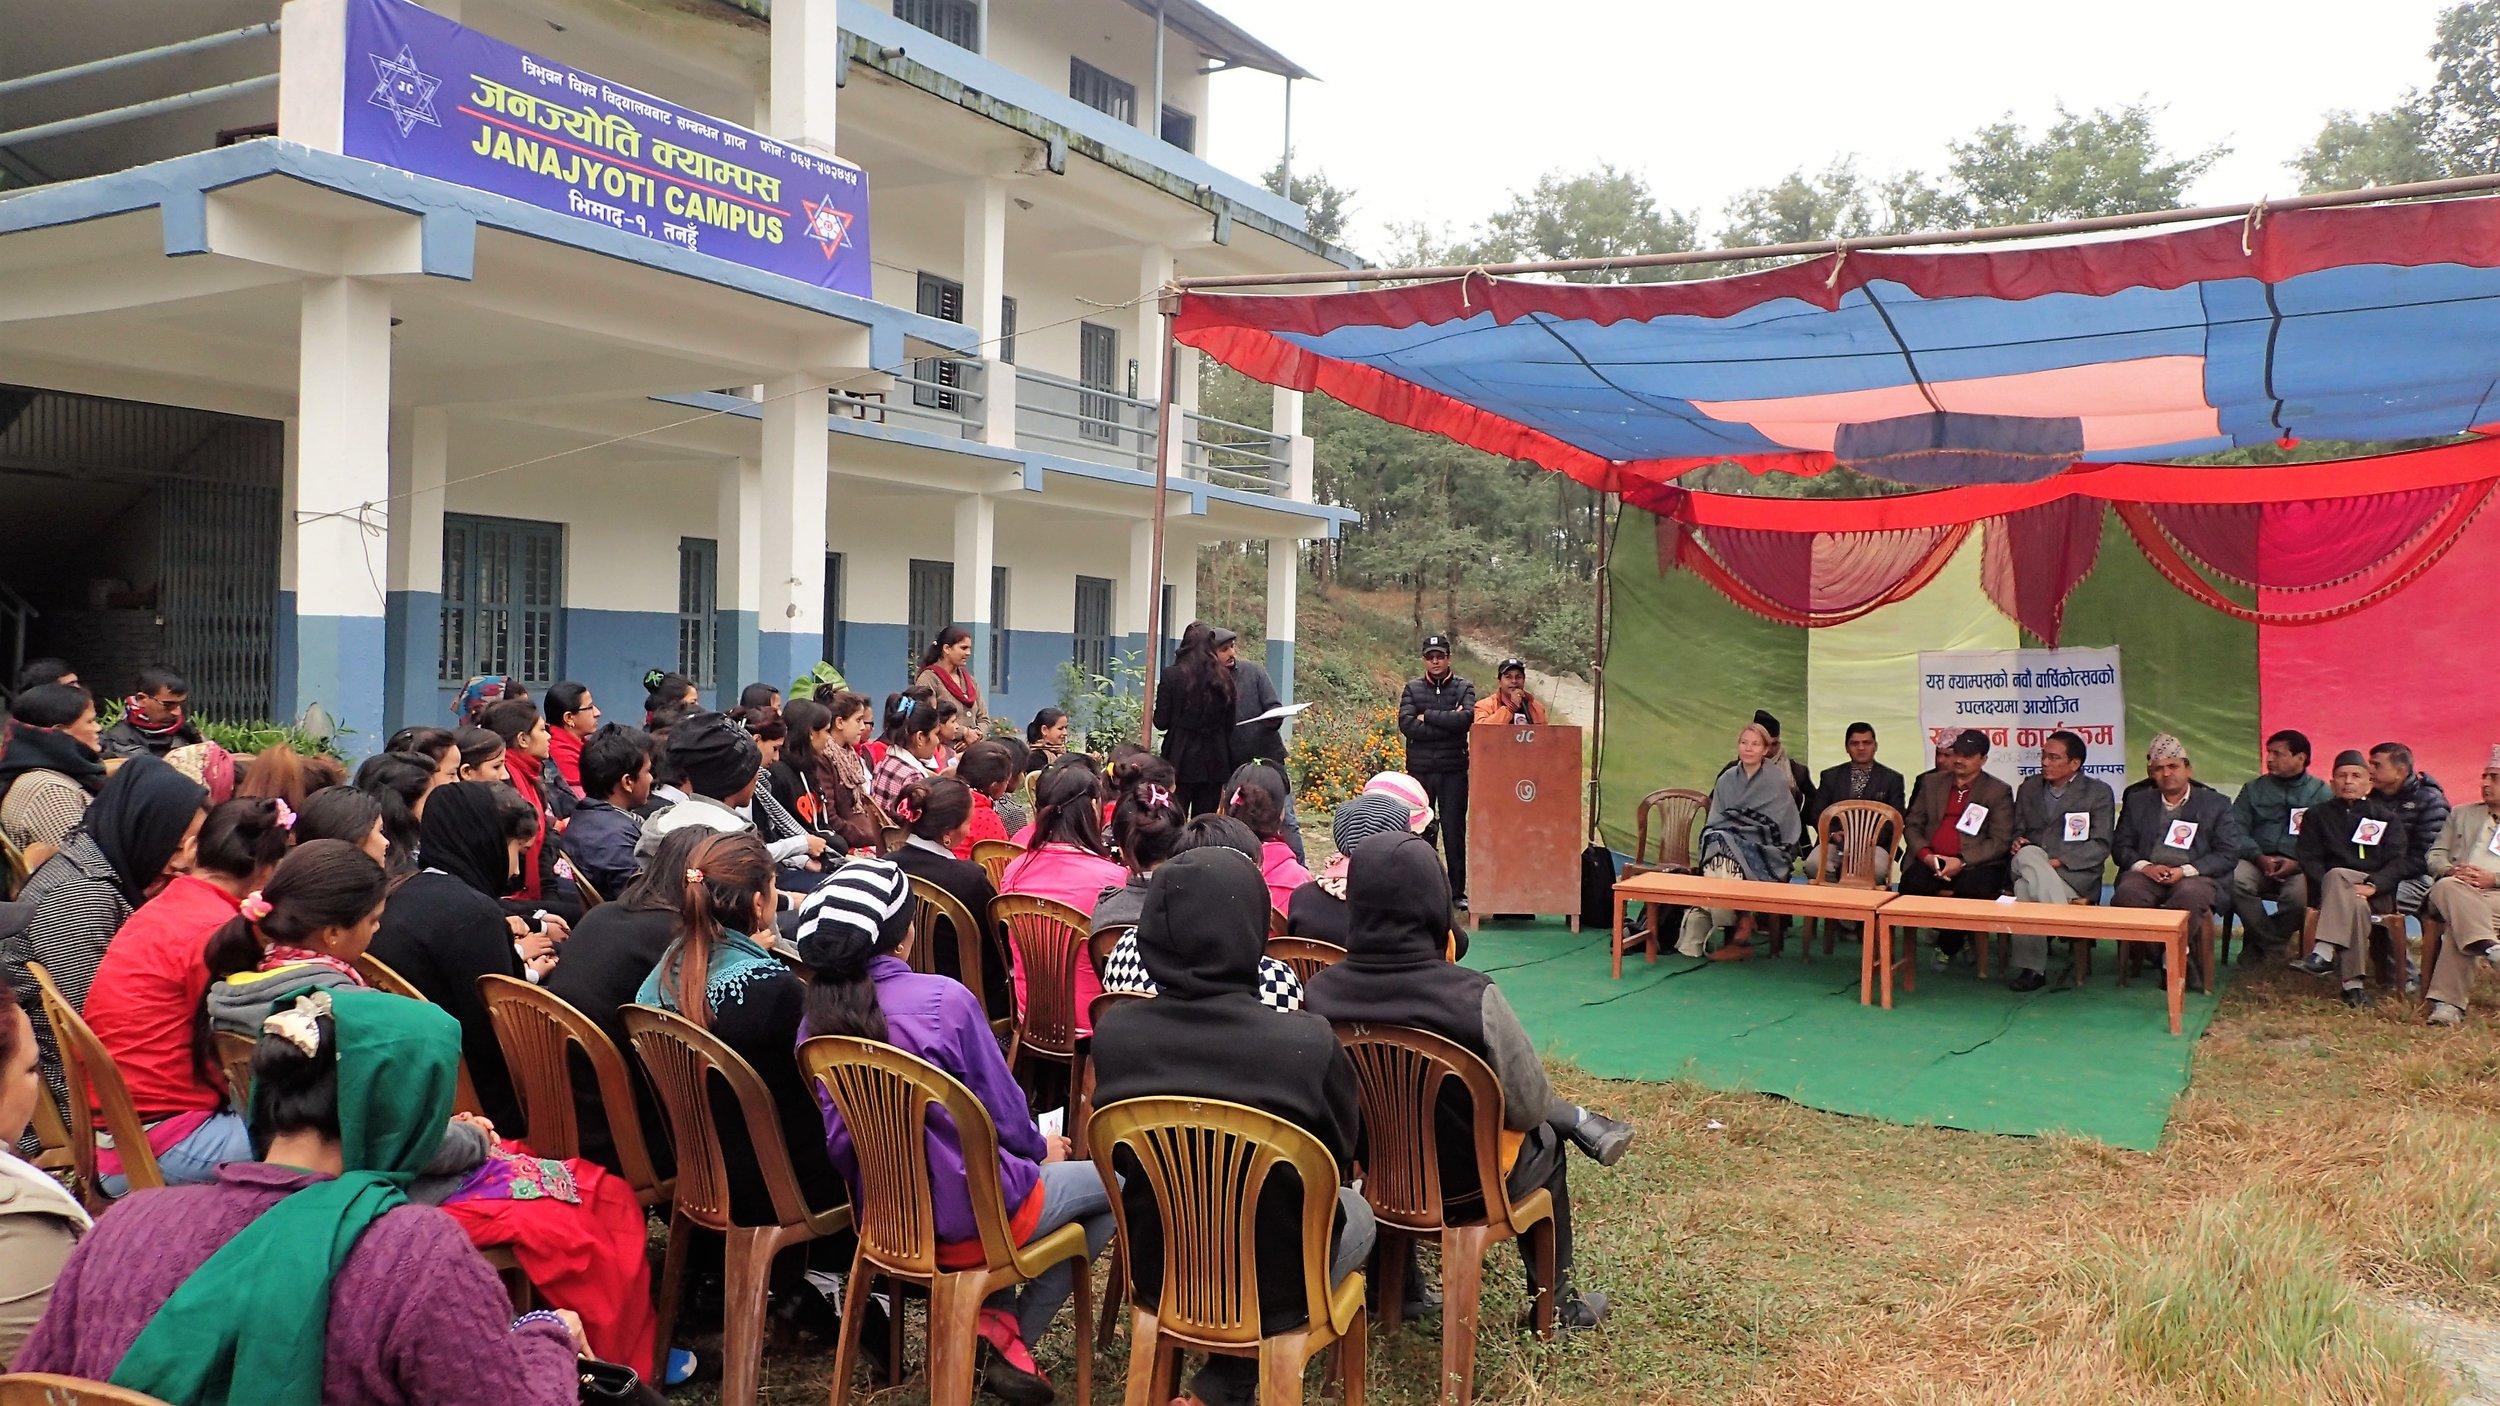 Establishment of new Youth Circle at Janajyoti Campus, Tanahun District. Photo: Ola Opdal.